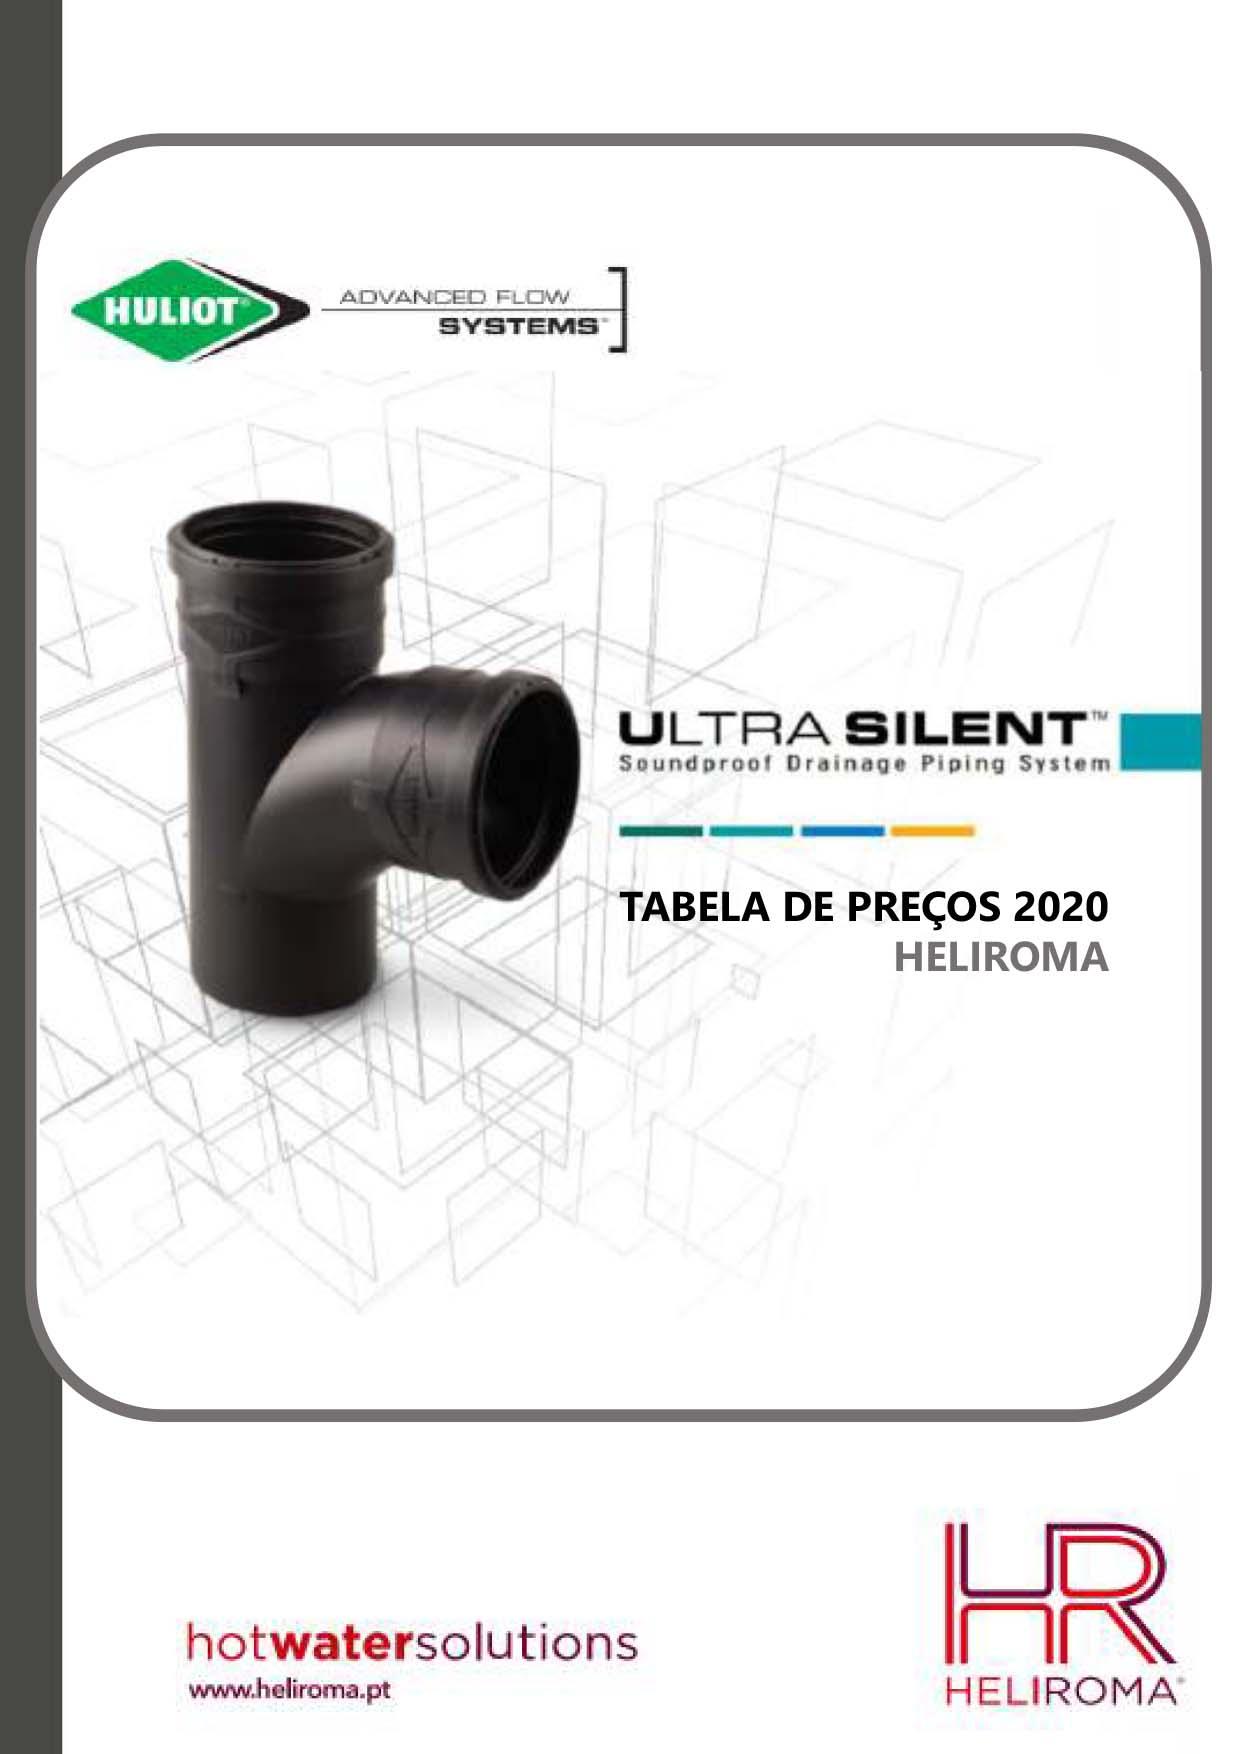 Heliroma Ultra Silent - Tabela de Preços